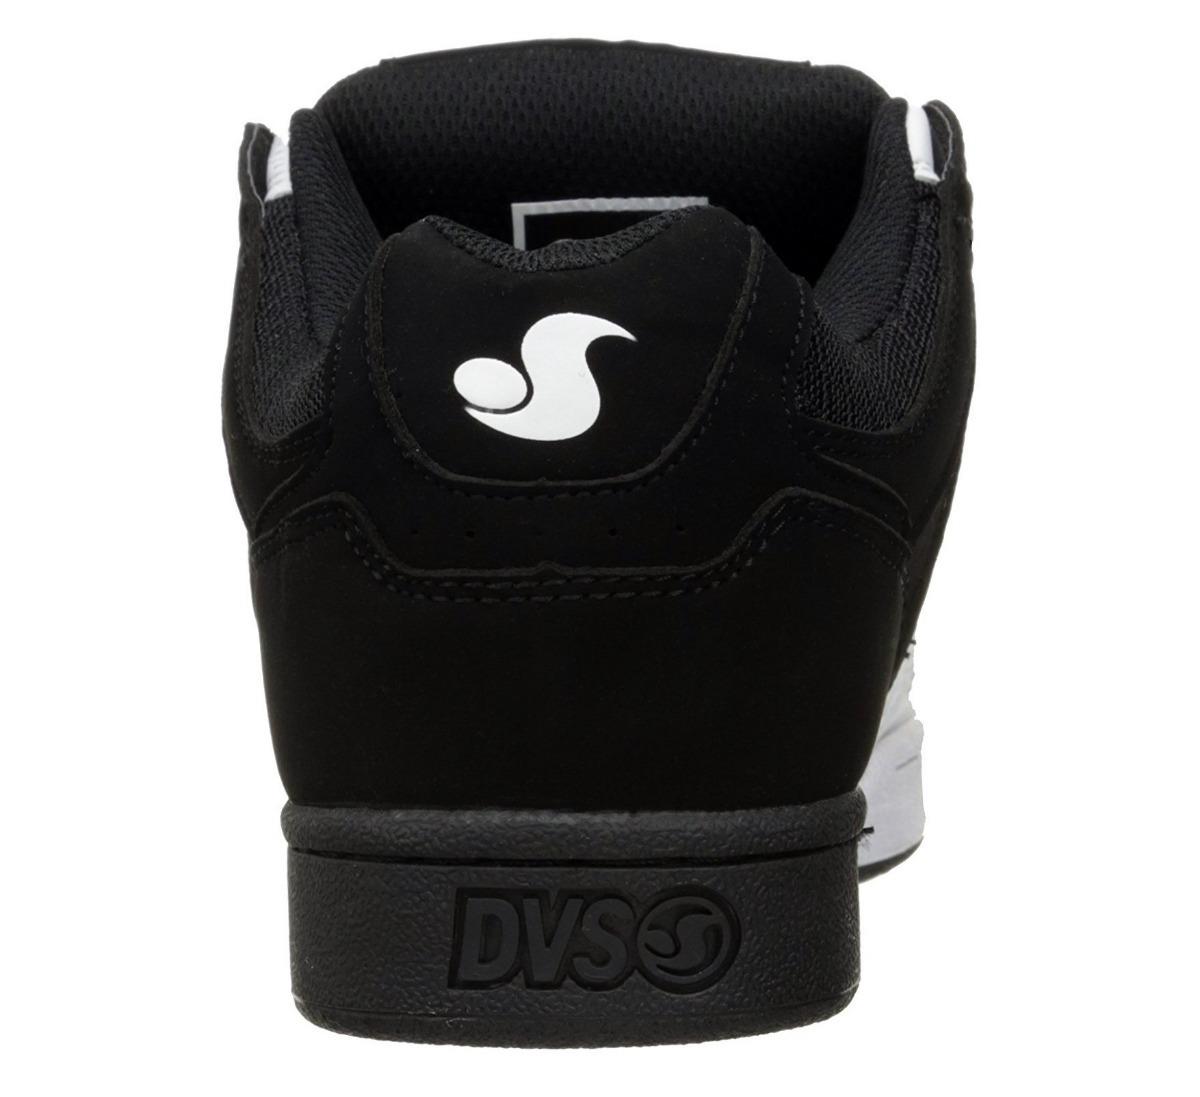 393f539177c tênis dvs celsius white black leather nubuck classic skate. Carregando zoom.